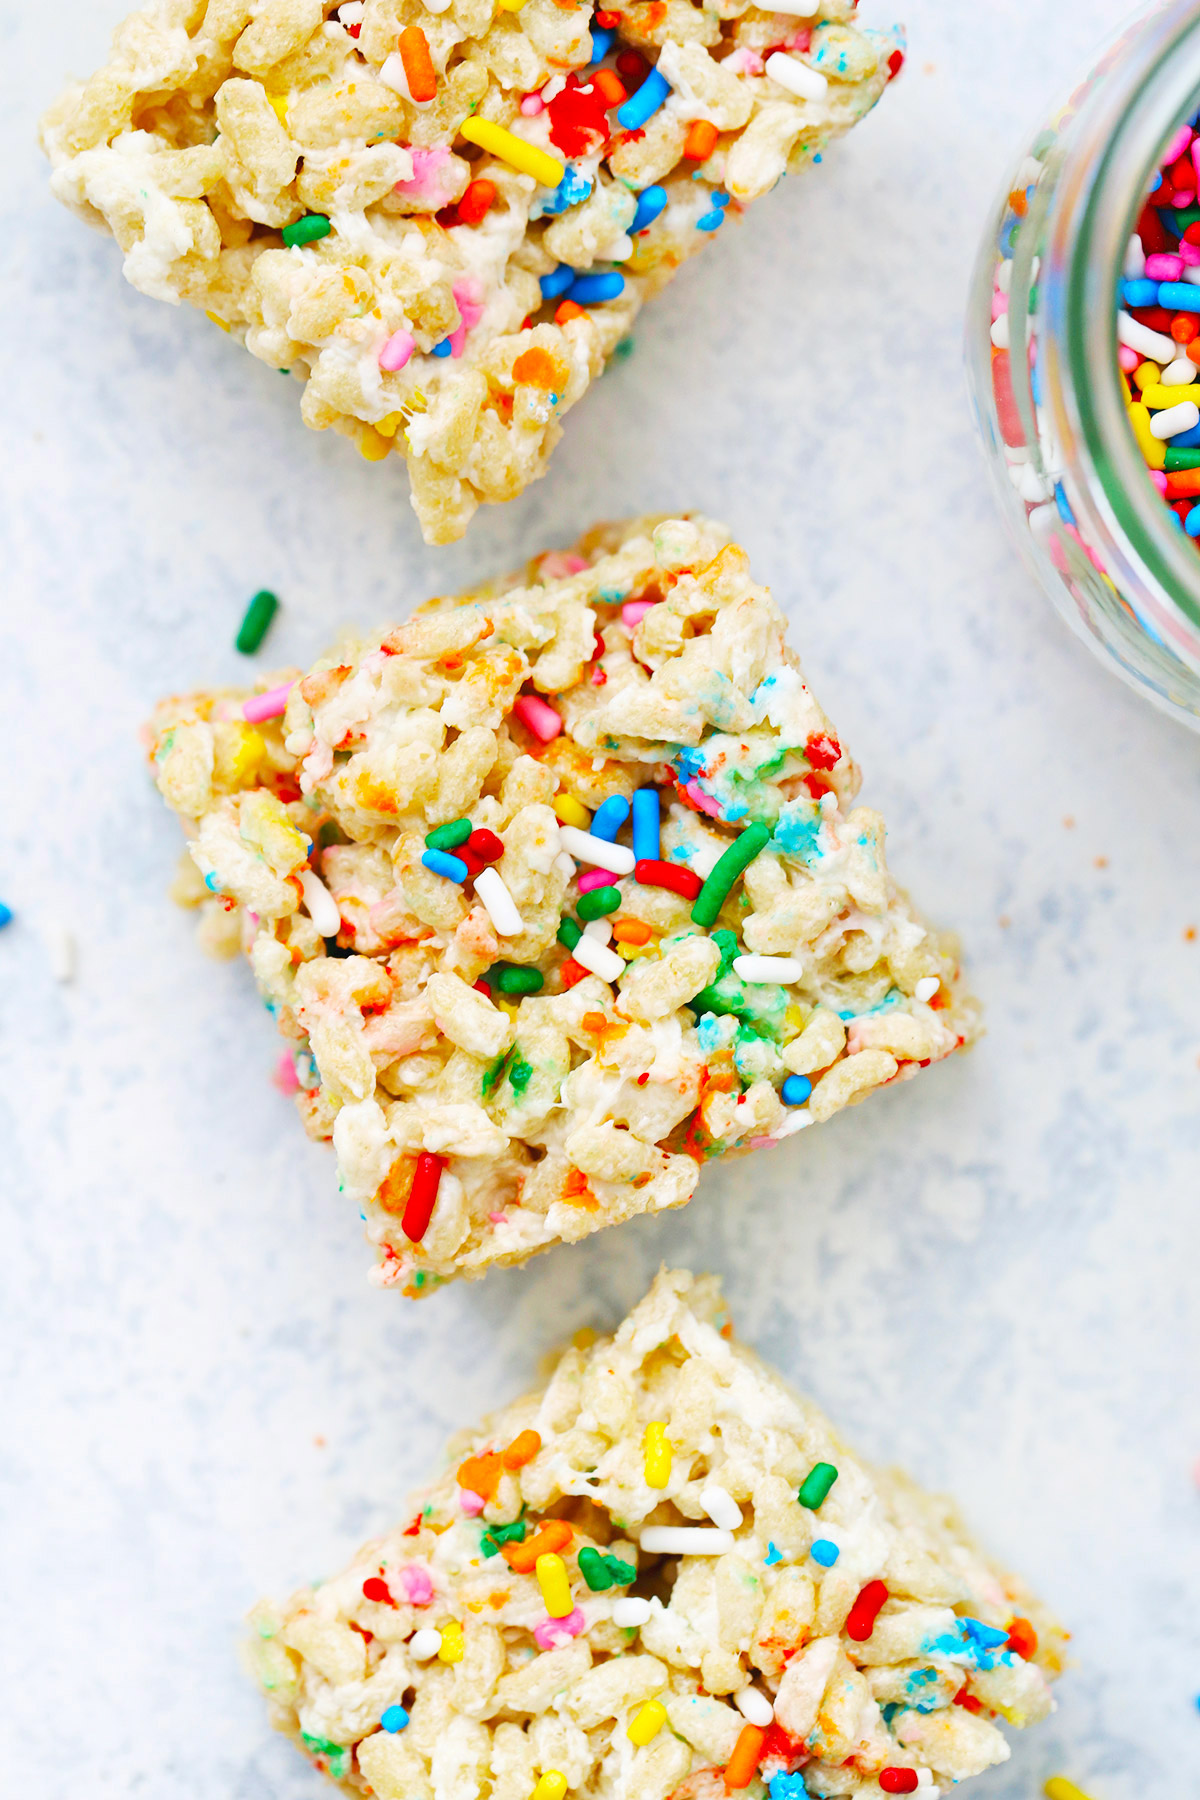 Superb Funfetti Birthday Cake Rice Krispies Treats Gluten Free Vegan Personalised Birthday Cards Sponlily Jamesorg